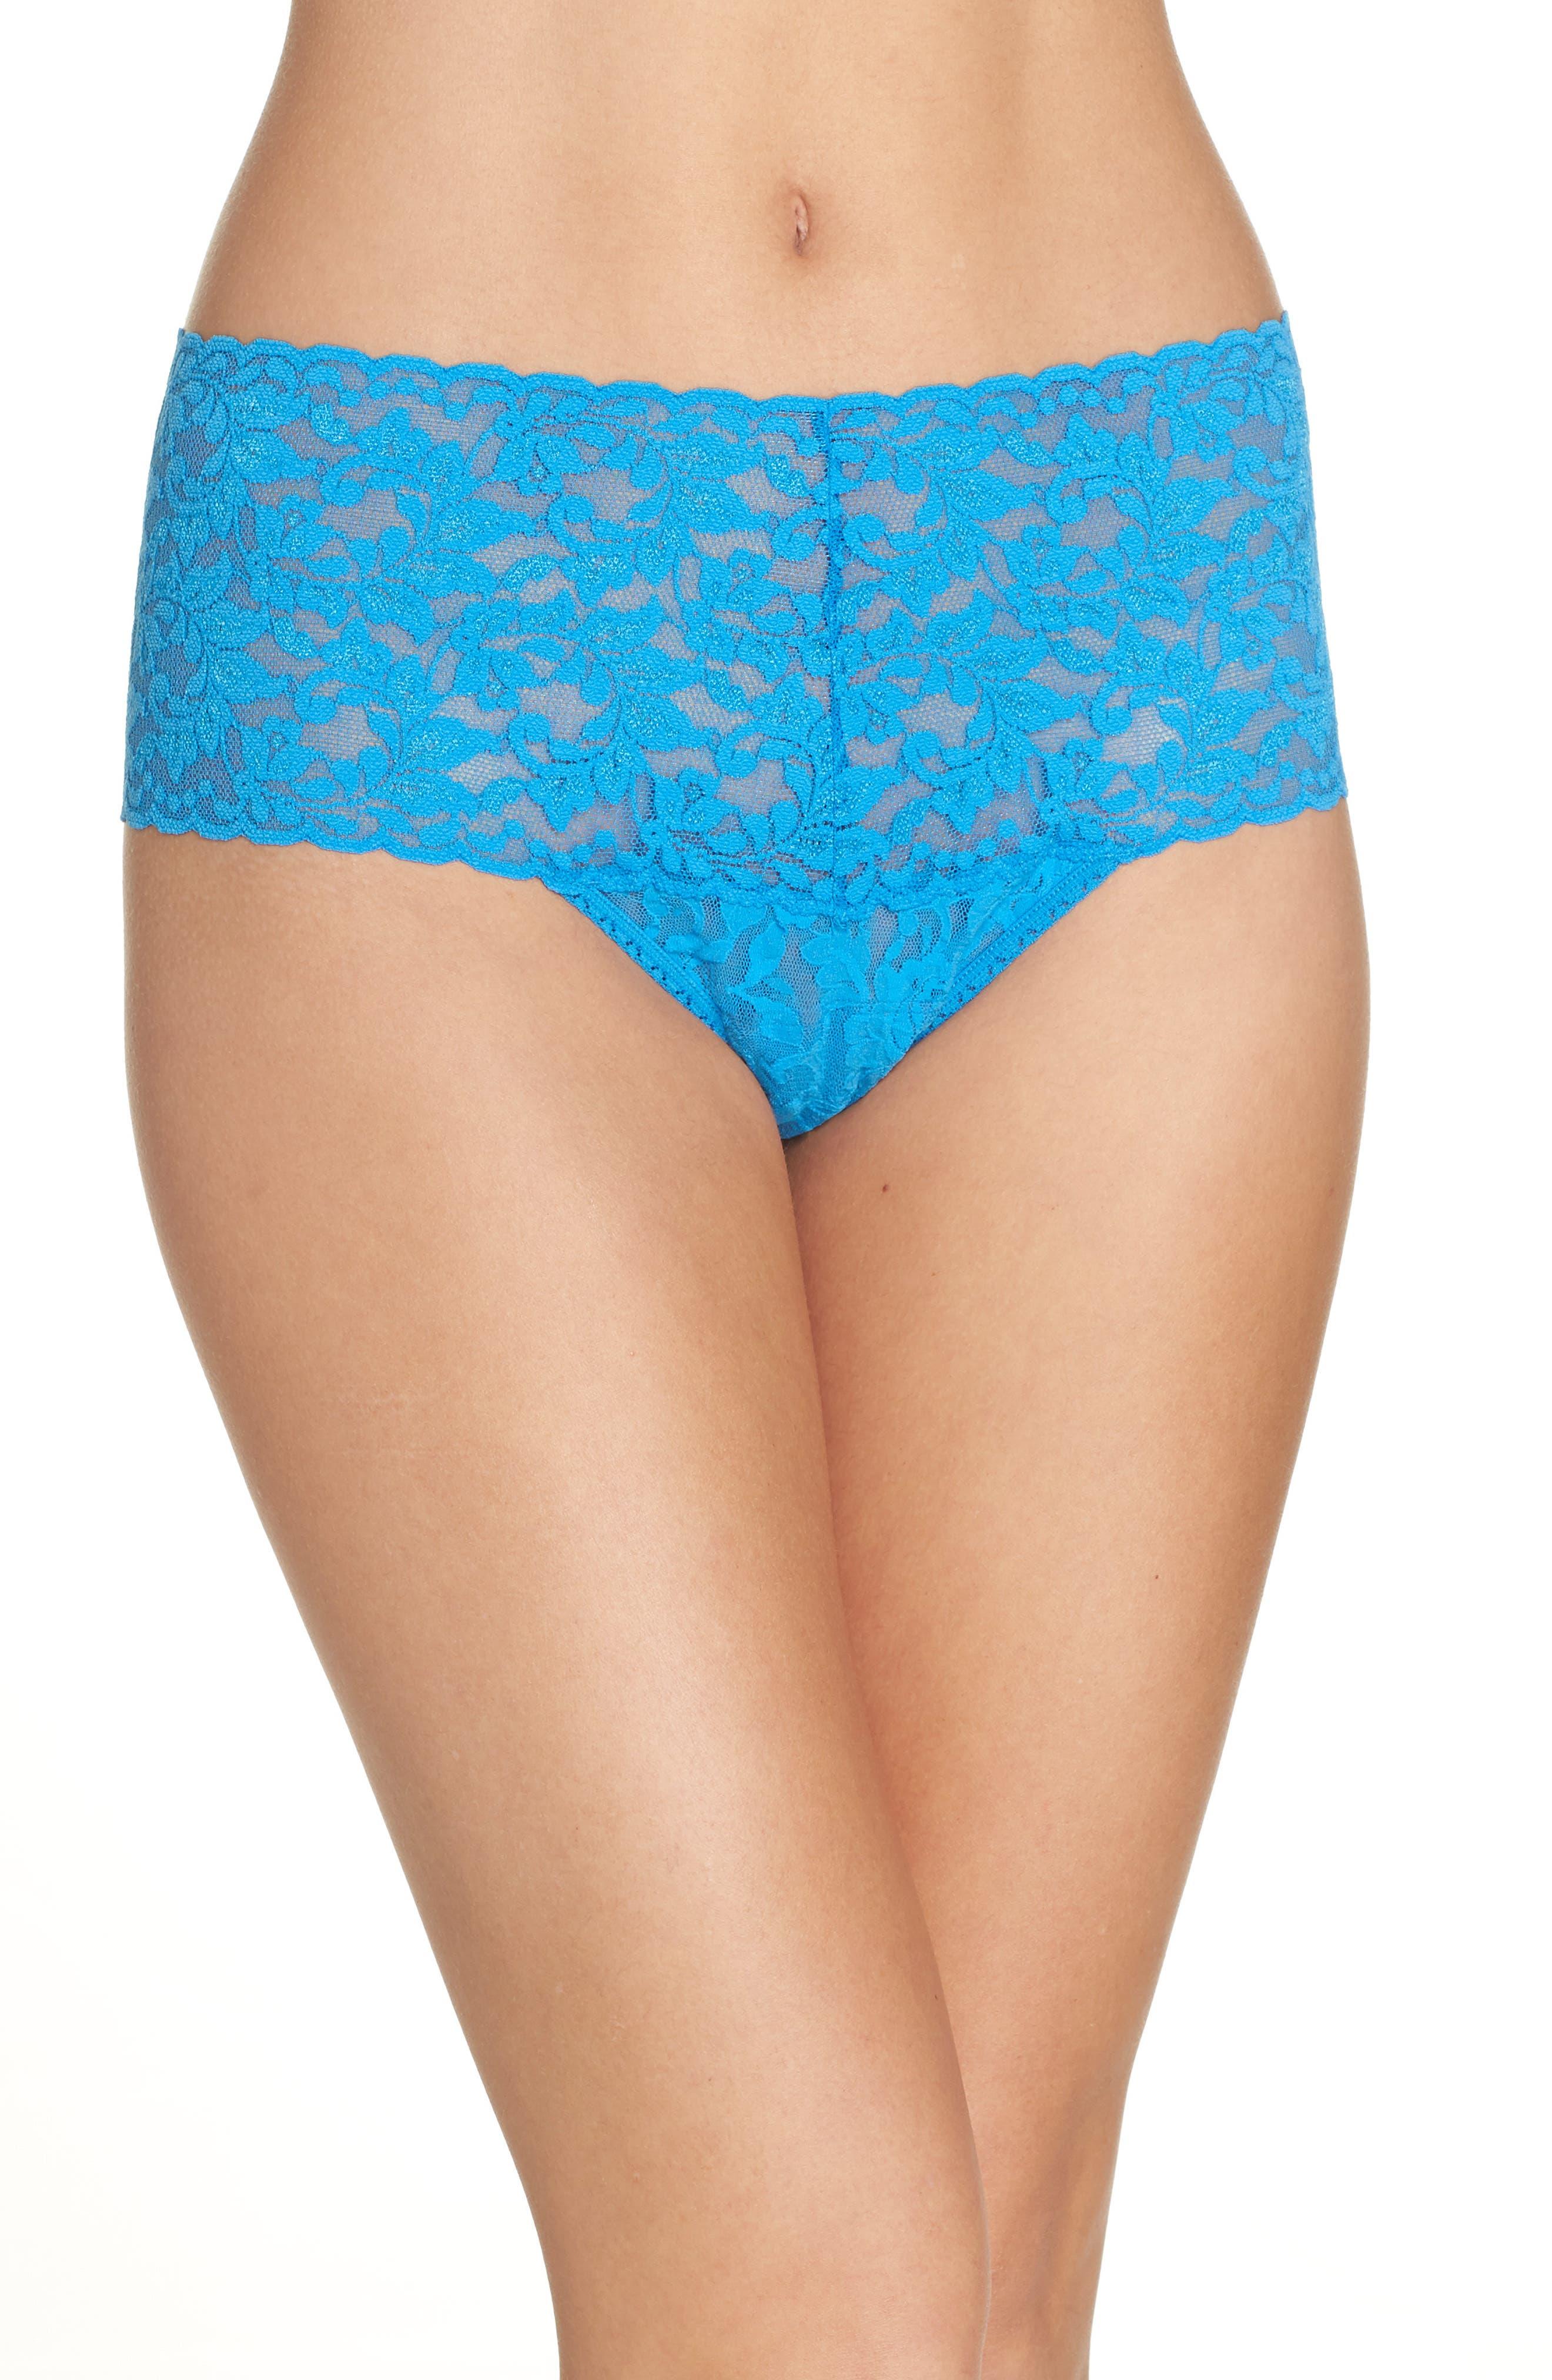 HANKY PANKY 'Retro' Thong, Main, color, LAGUNA BLUE